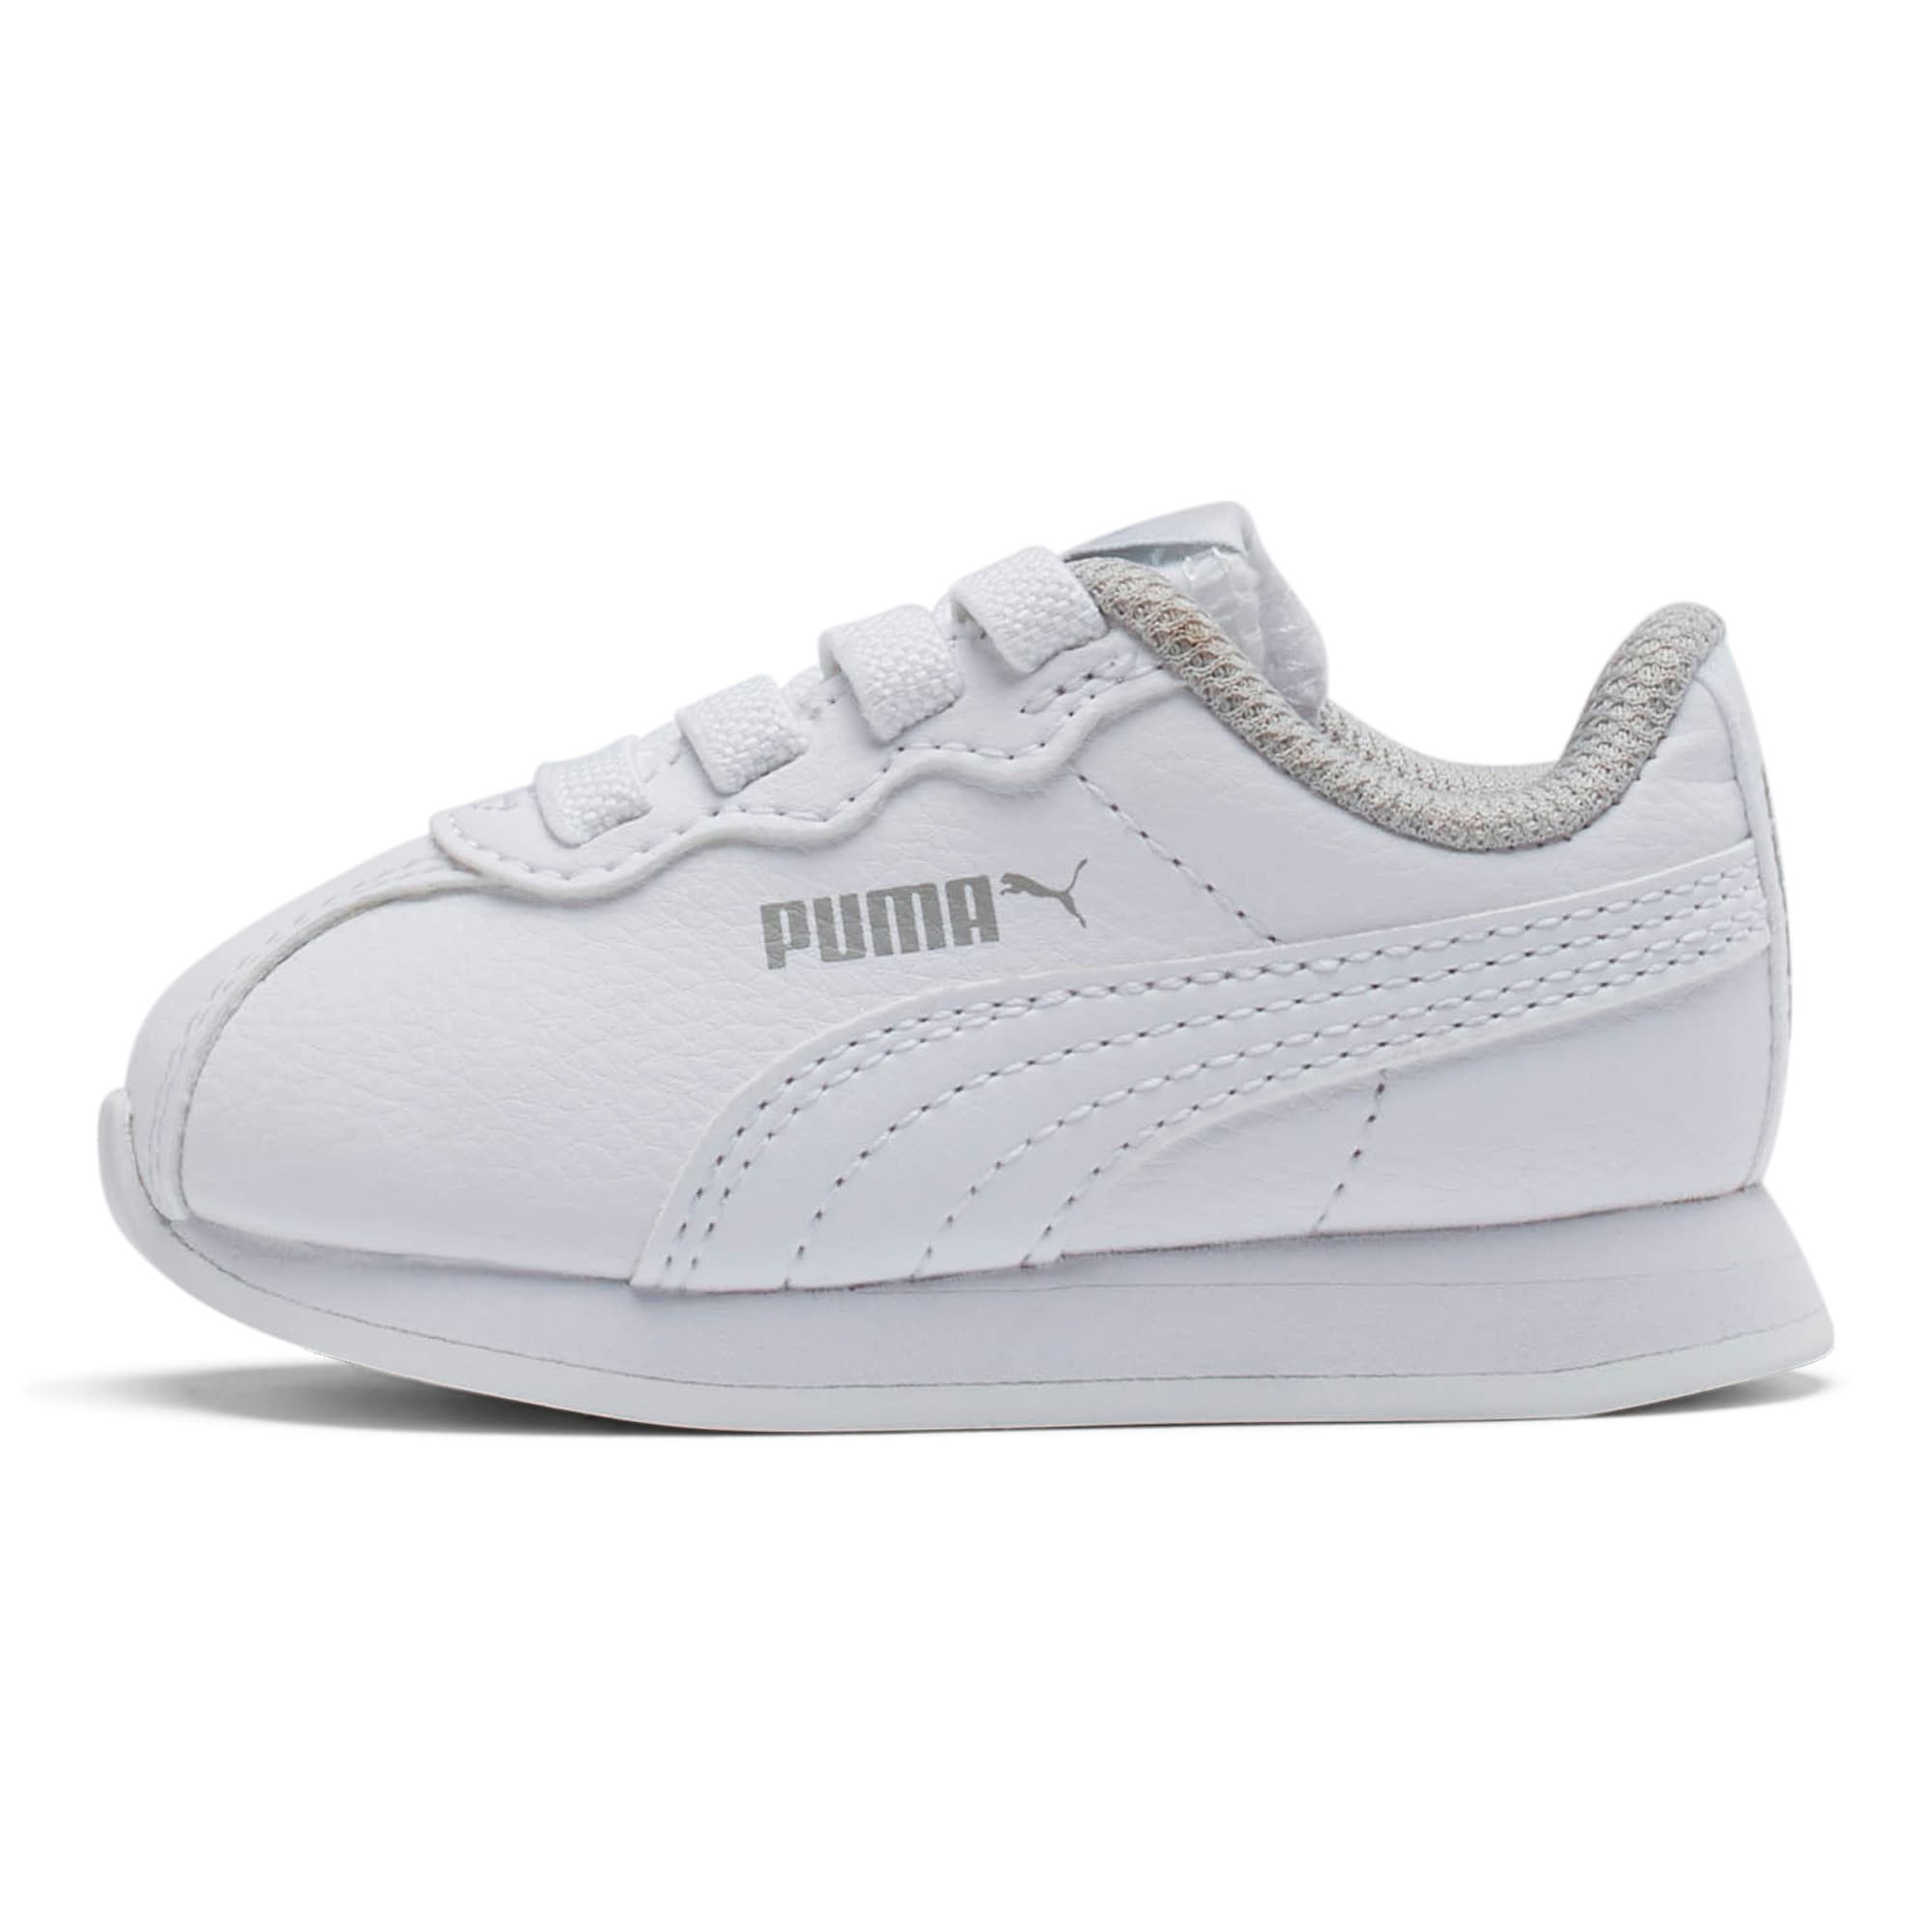 Thumbnail 1 of Turin II AC Toddler Shoes, Puma White-Puma White, medium